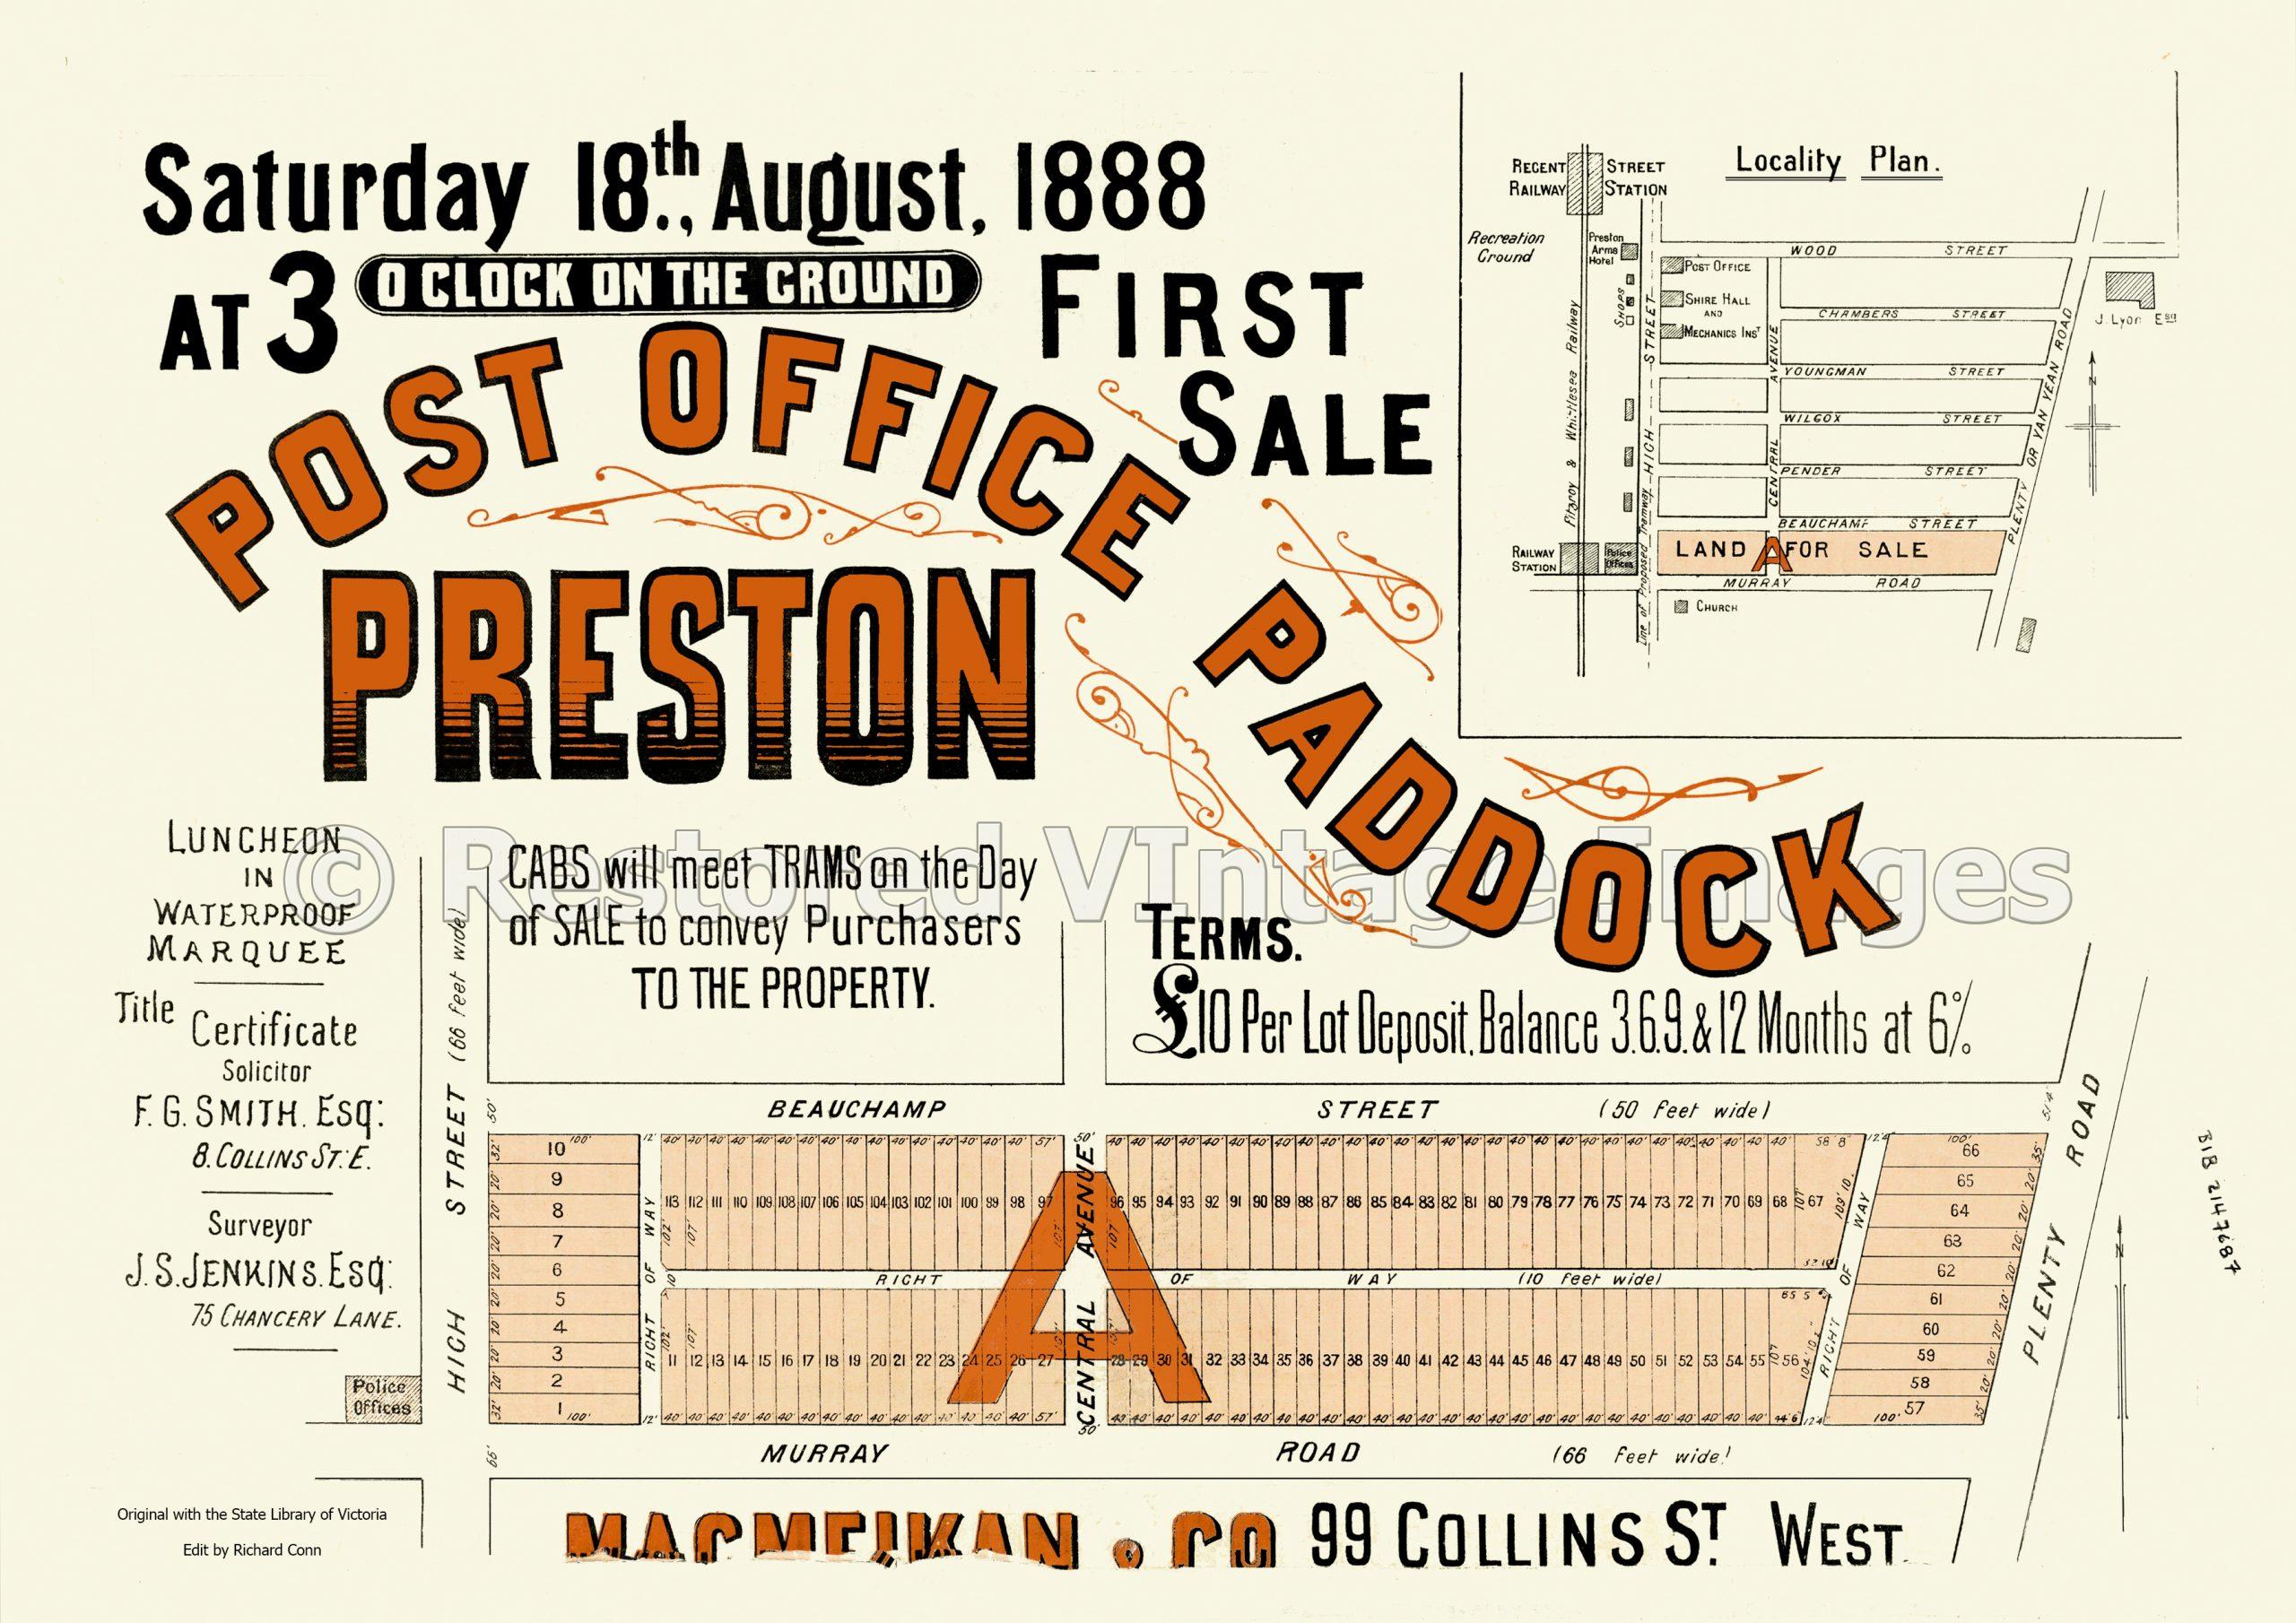 Post Office Paddock First Sale 18th August 1888 – Preston